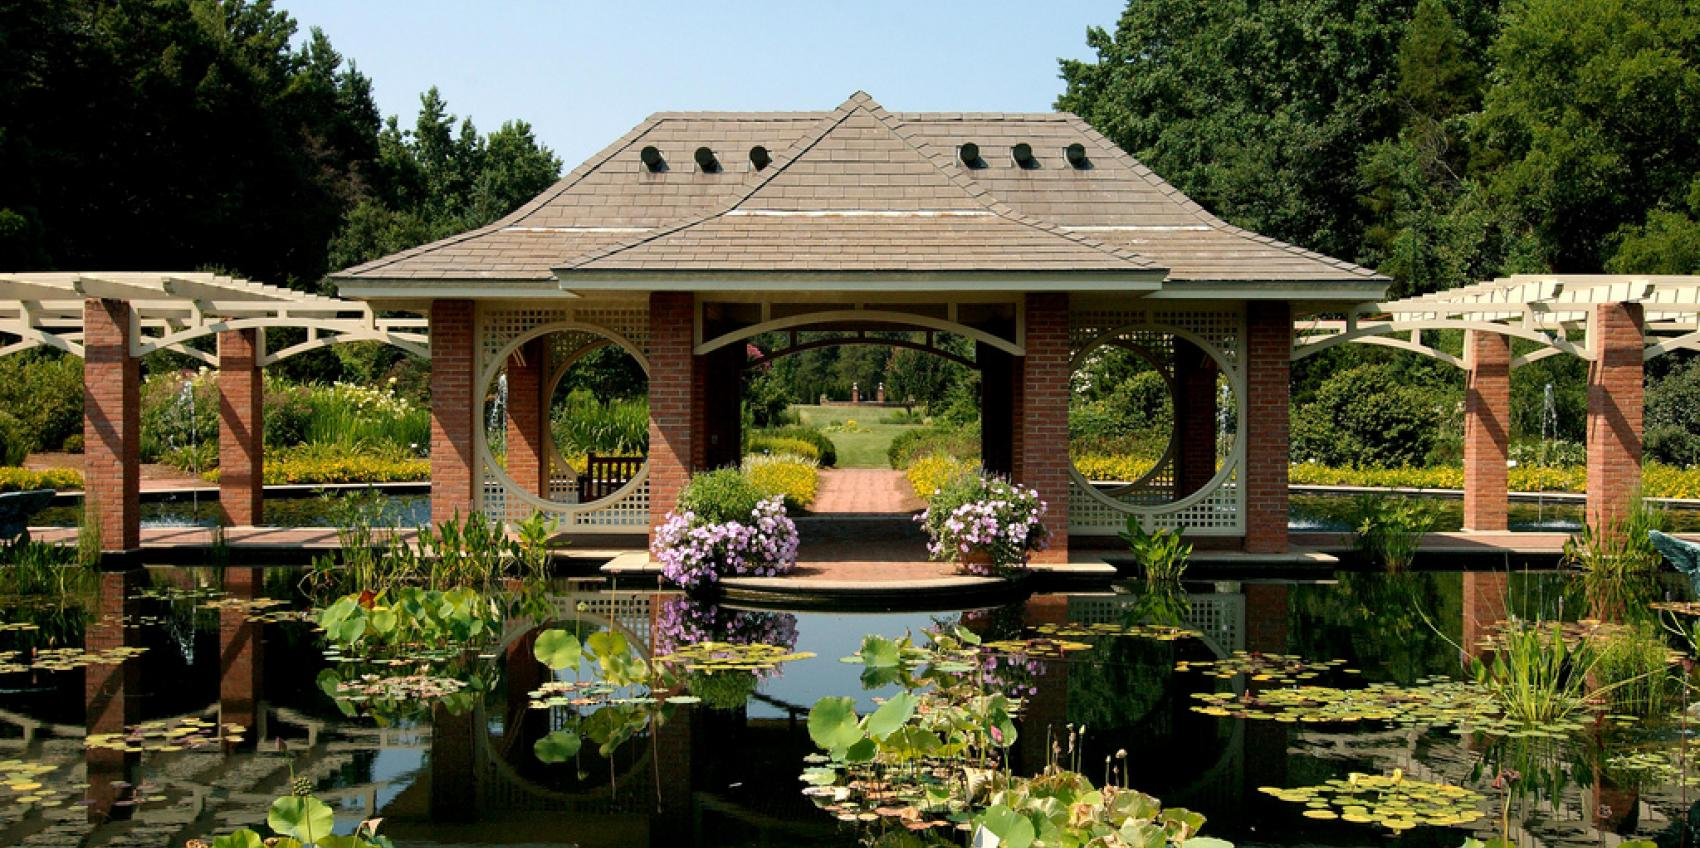 Huntsville Botanical Garden American Public Gardens Association